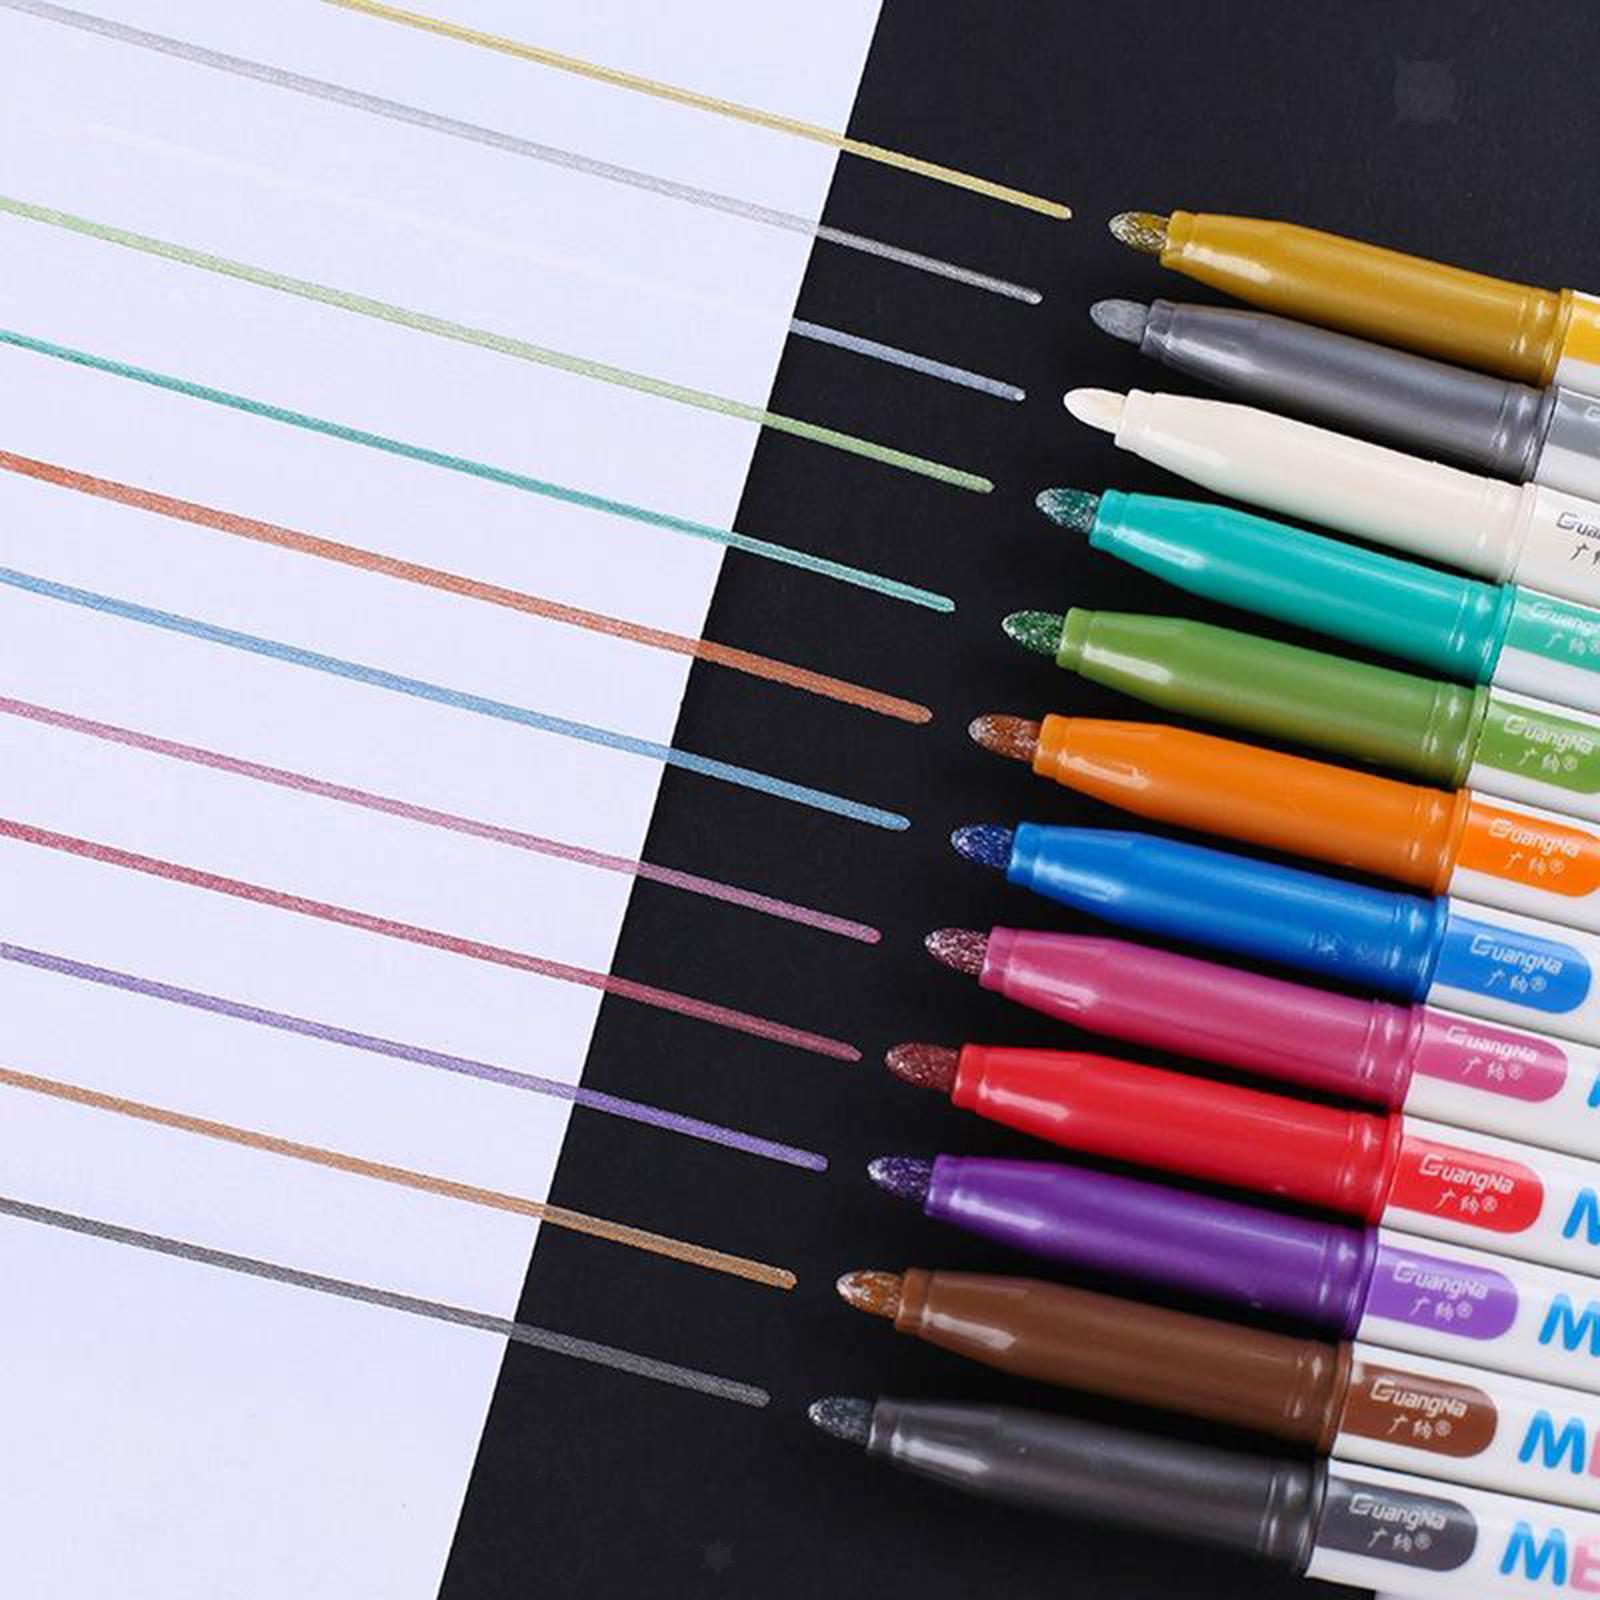 miniatura 29 - 8-12-20x-Permanente-Metallic-Marcatori-Vernici-Penne-per-Adulti-Colouring